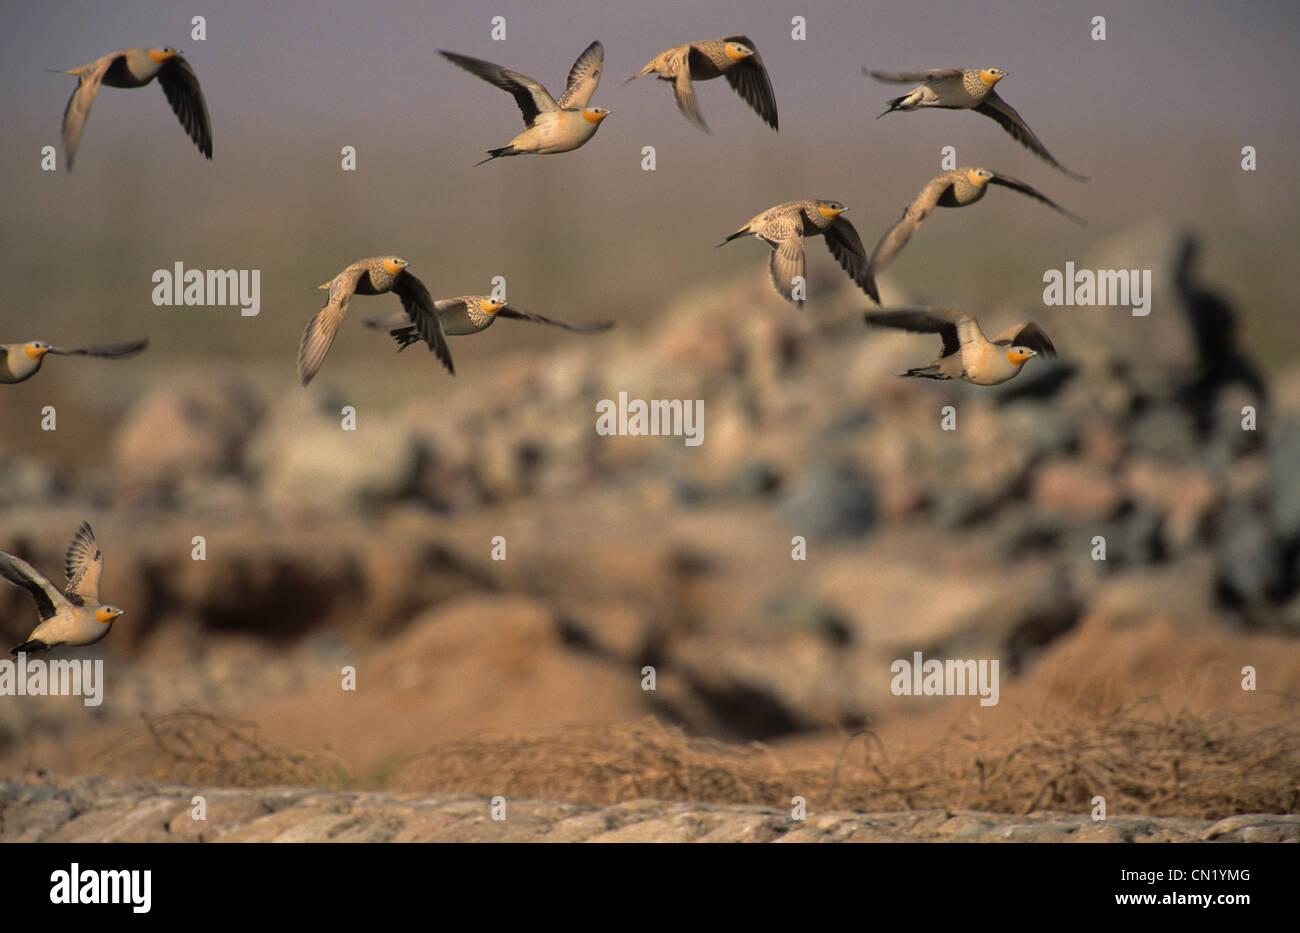 Spotted Sandgrouse (Pterocles senegallus) flock in flight Sinai Egypt Stock Photo